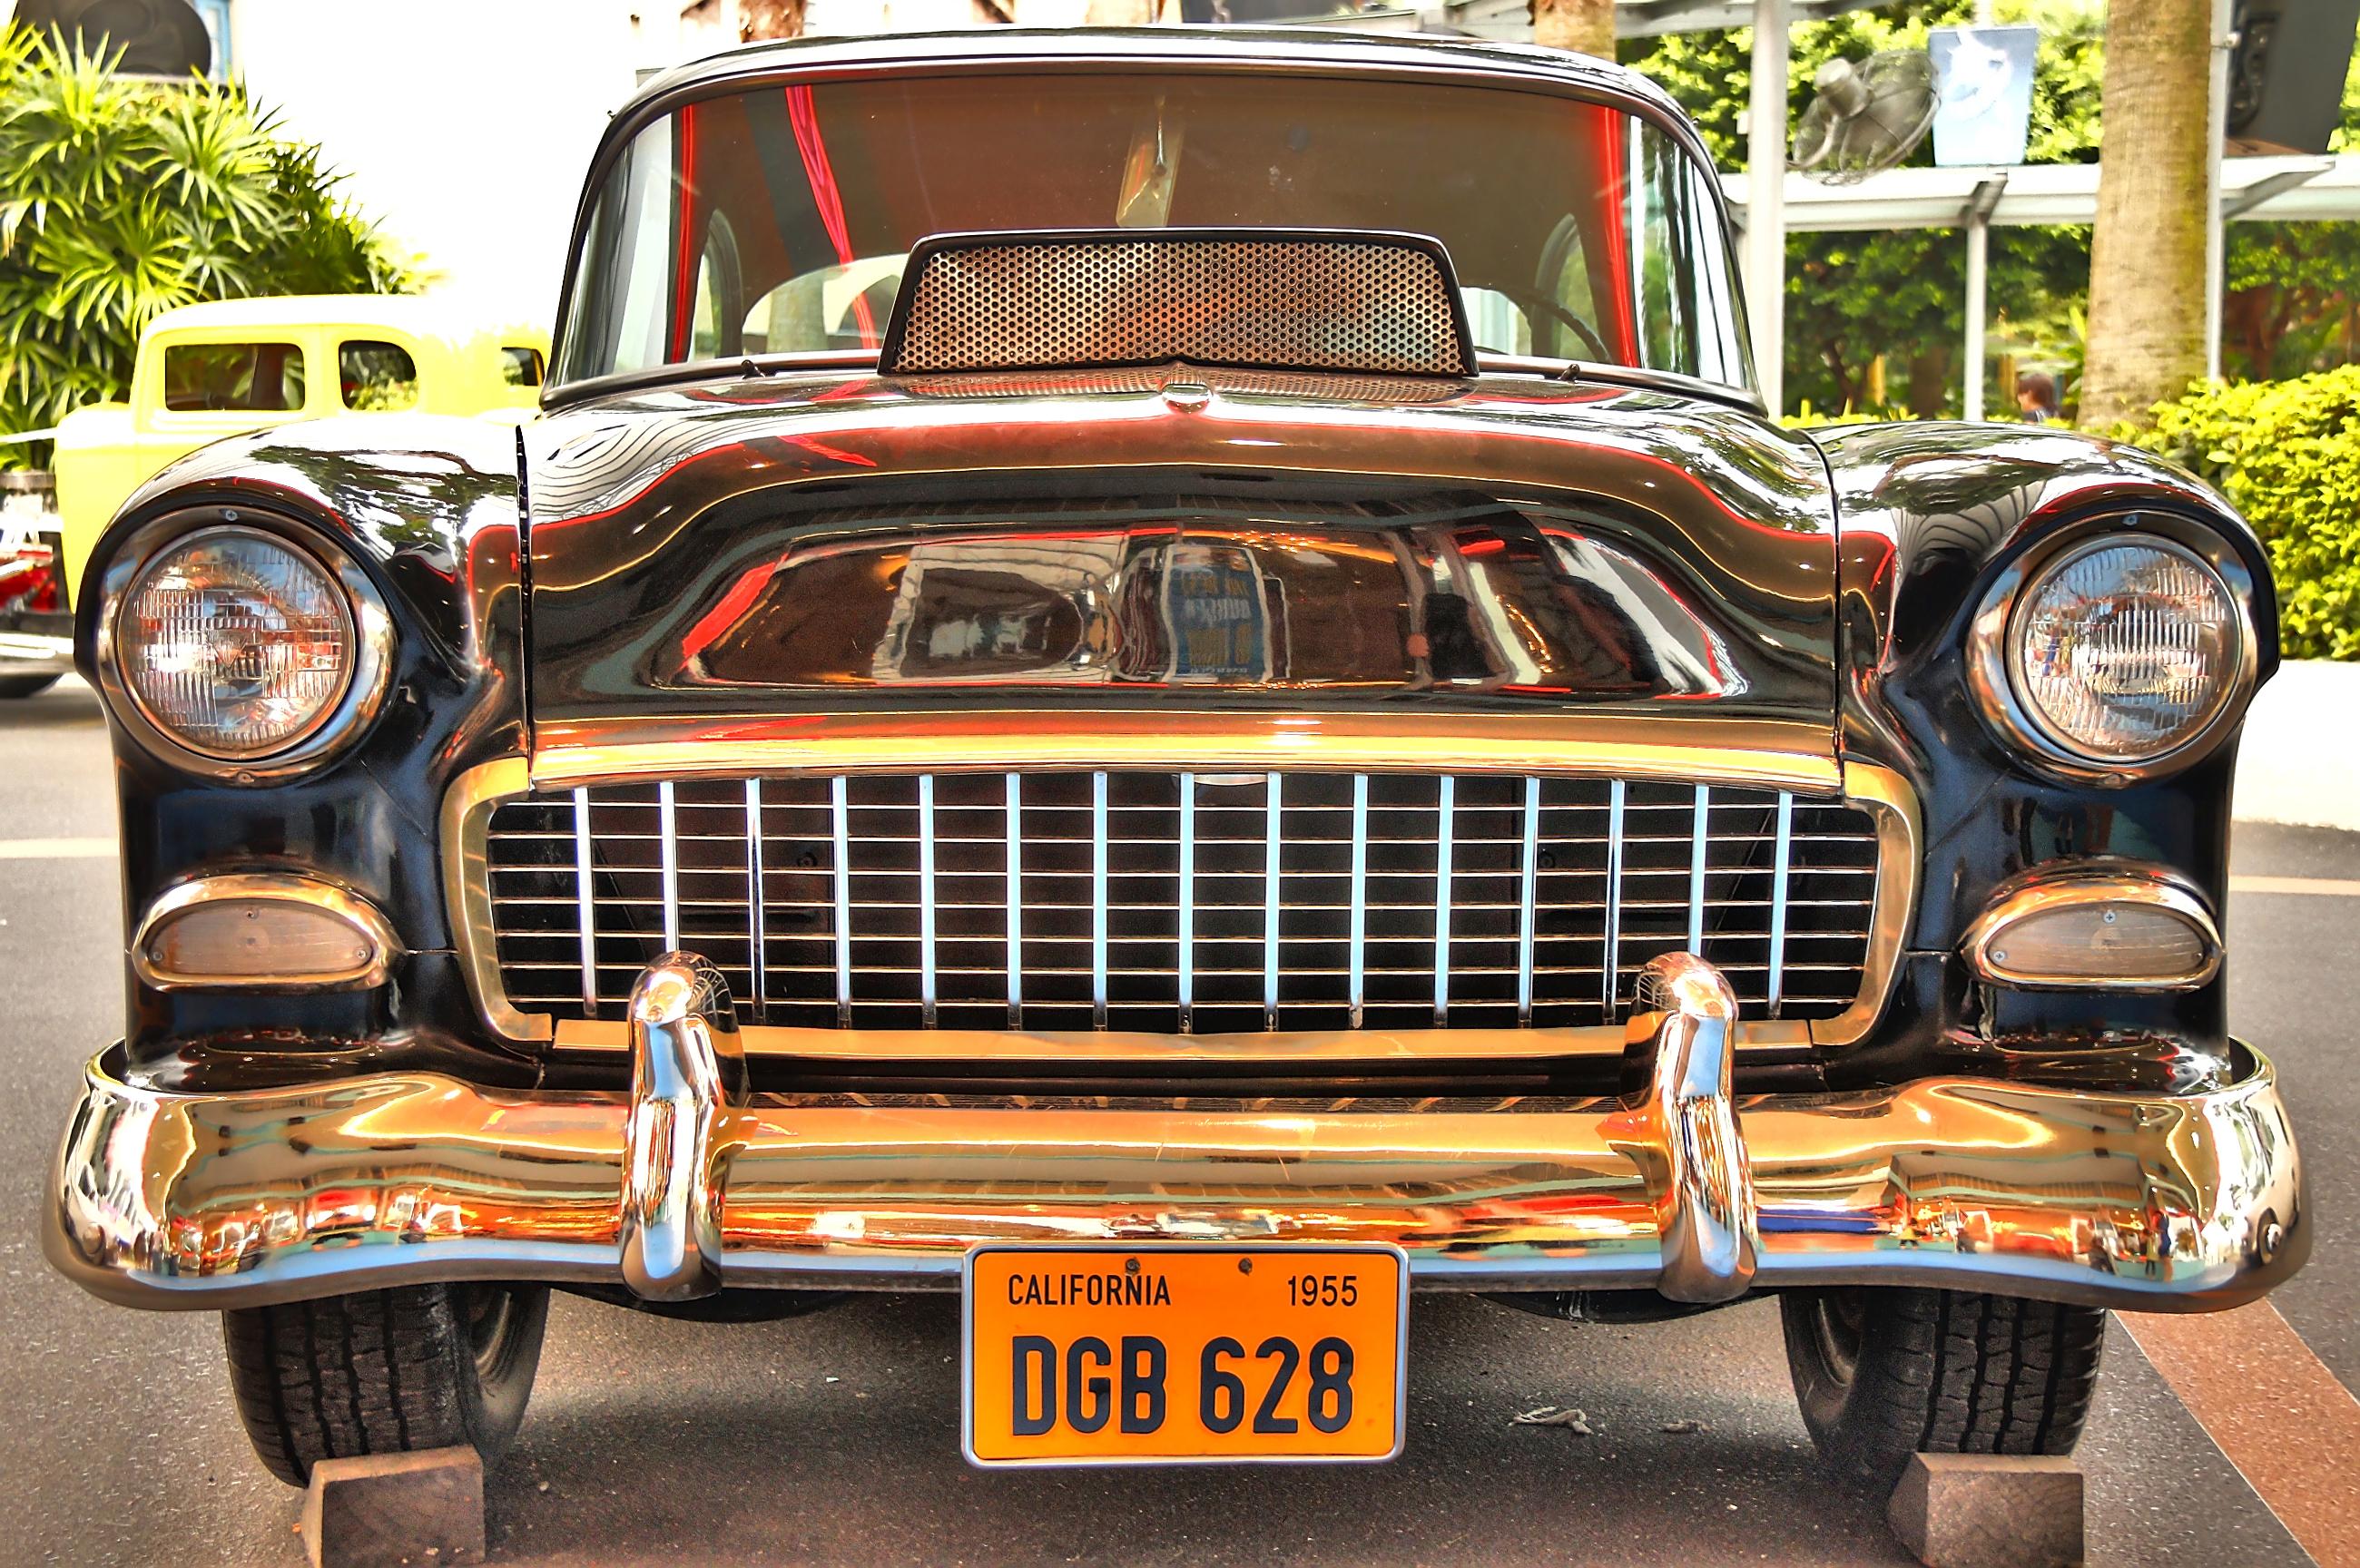 File:Vintage car, Universal Studios Singapore - 20120914-01.jpg ...